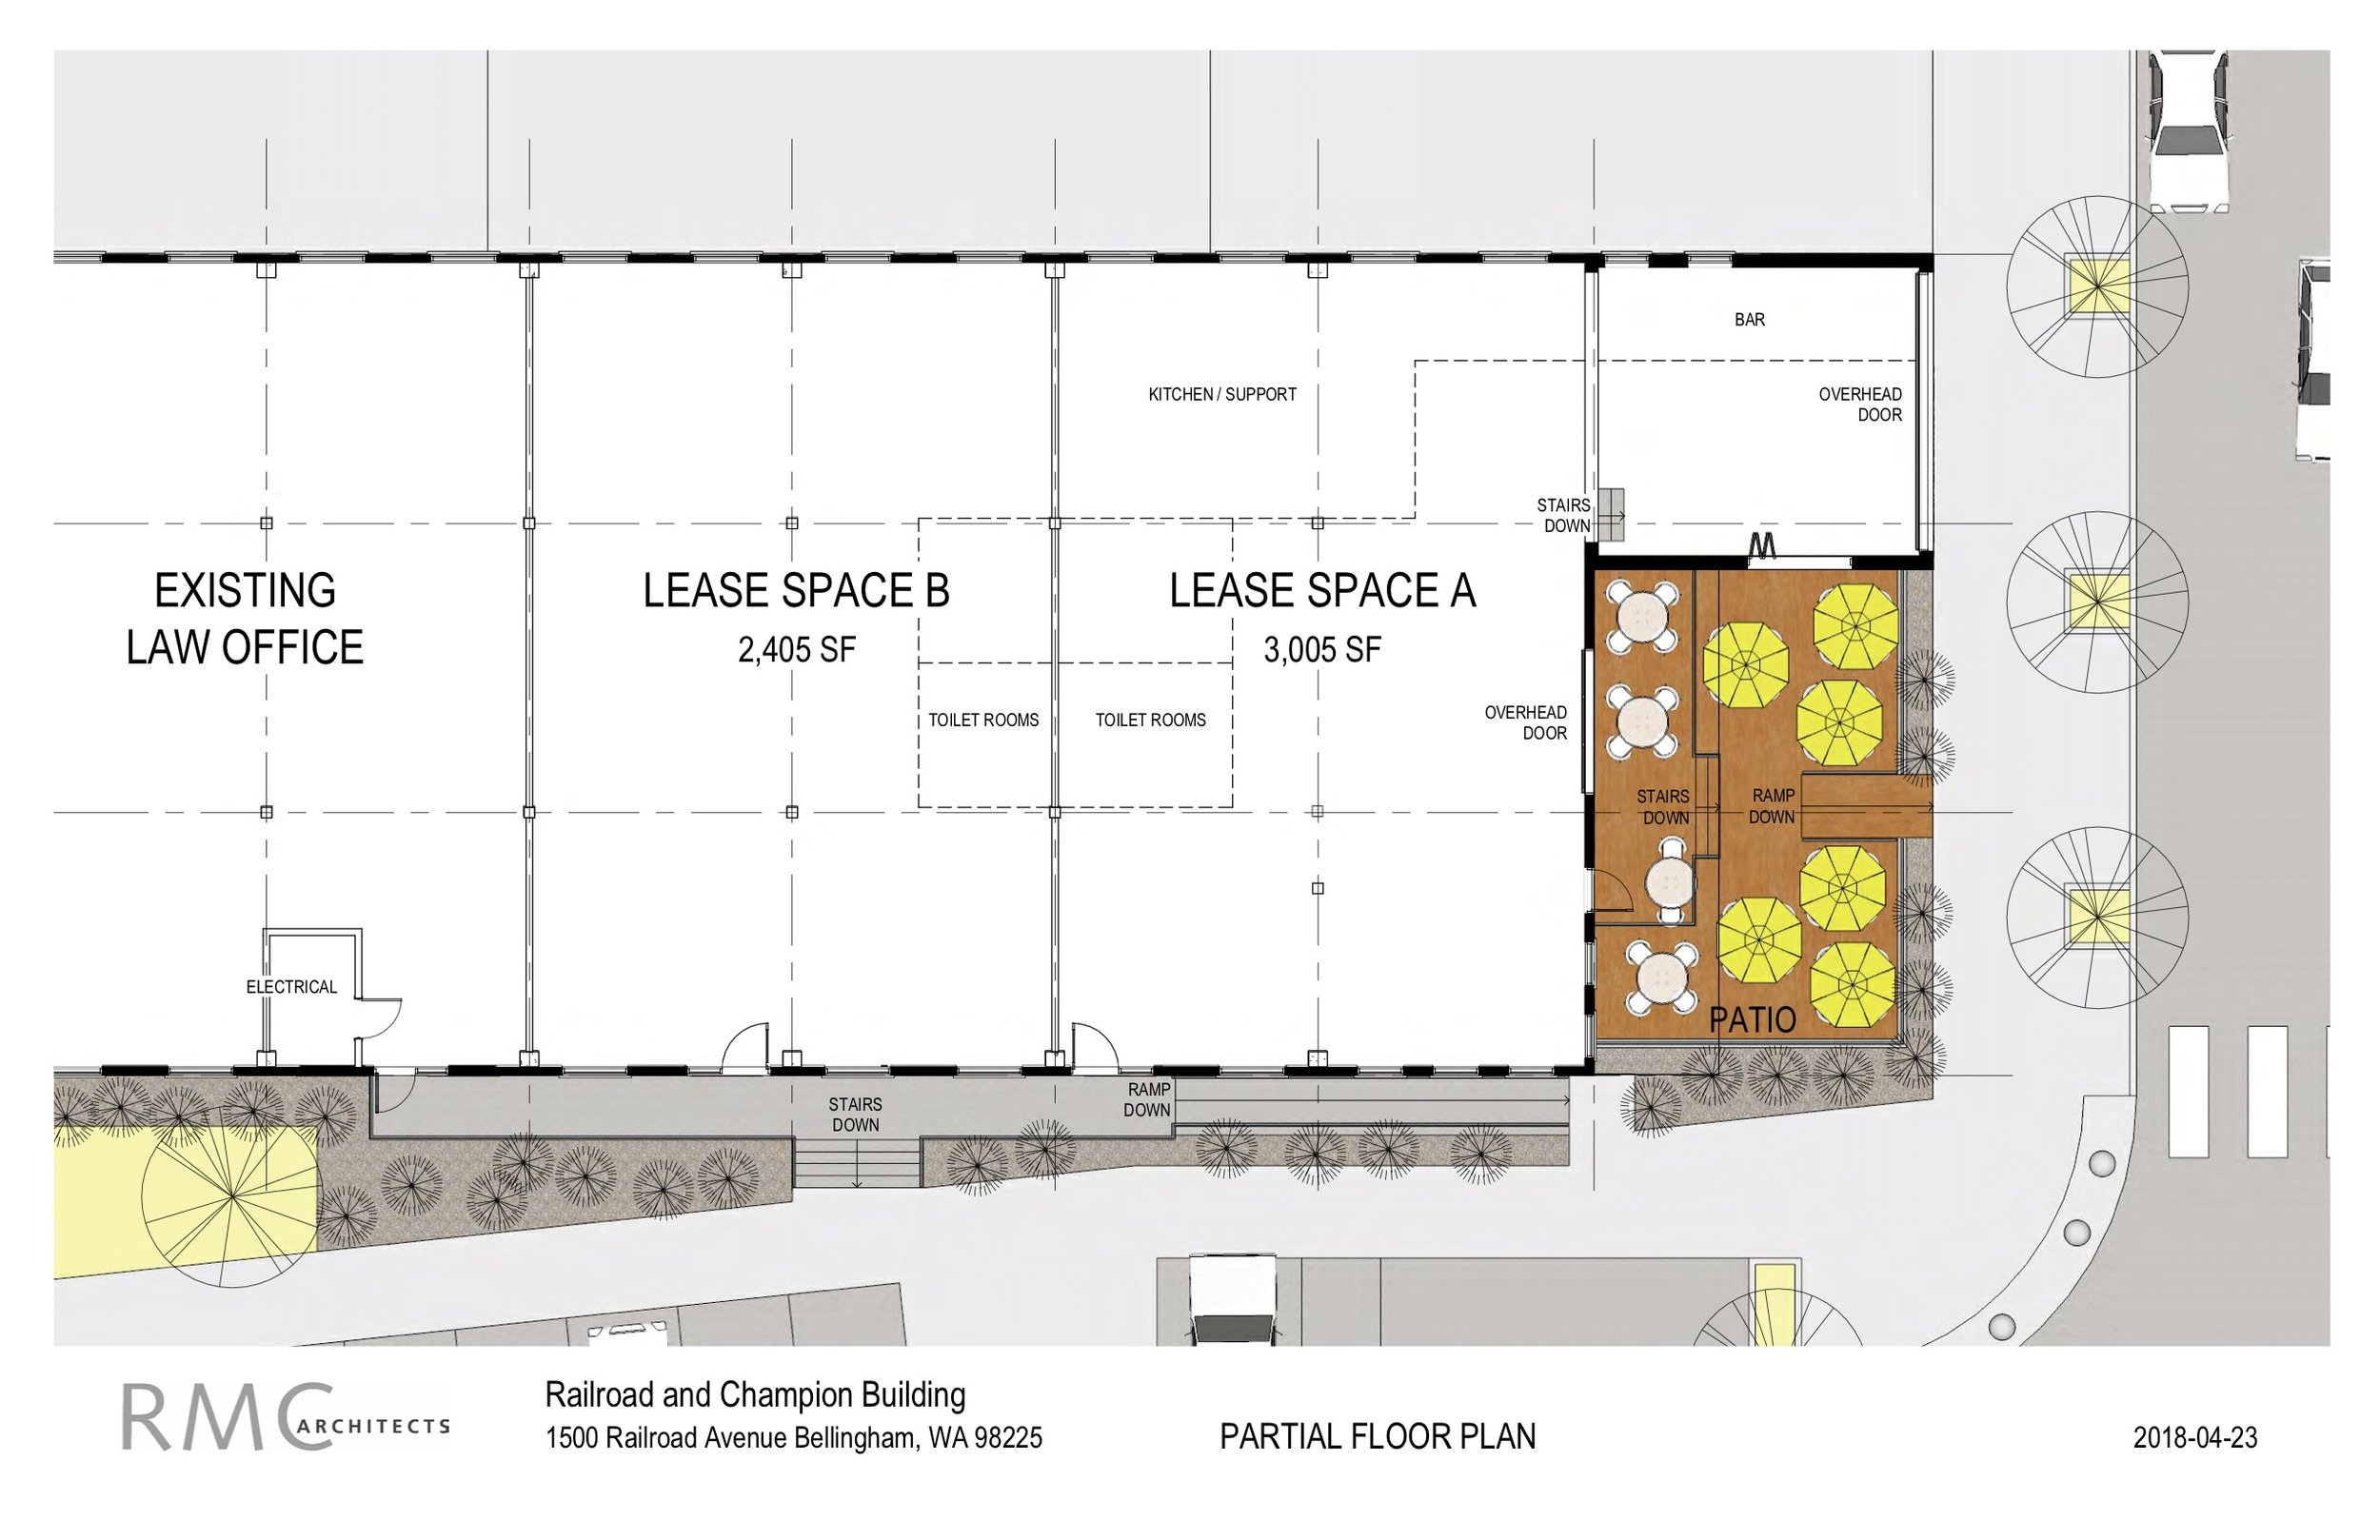 2018-05-01_1500 Railroad Building Marketing Plans_2.jpg